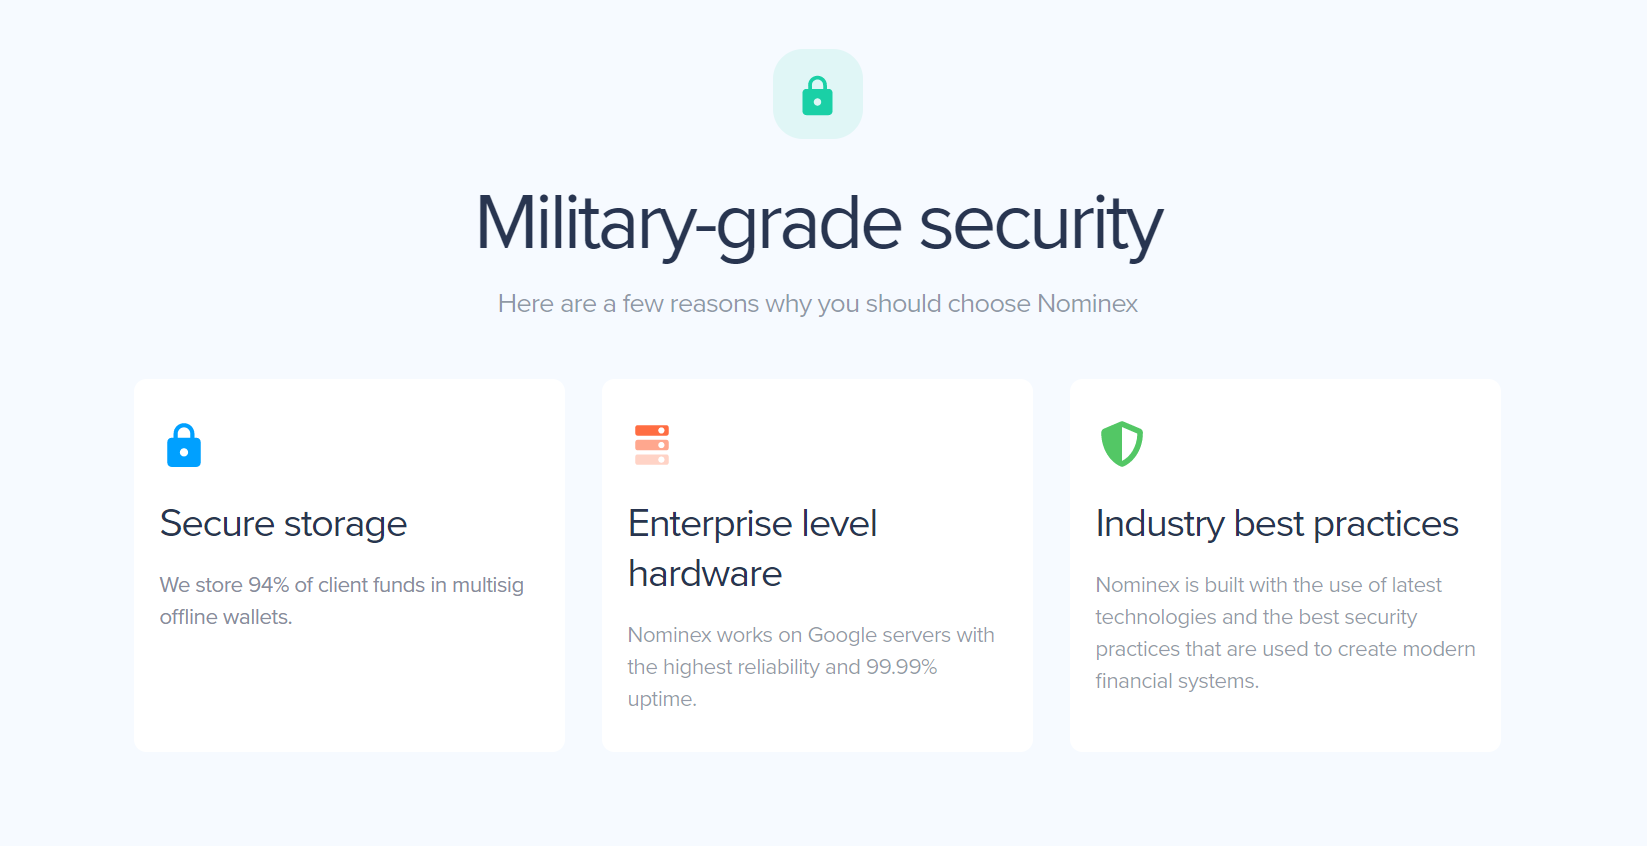 Nominex Military Grade Security